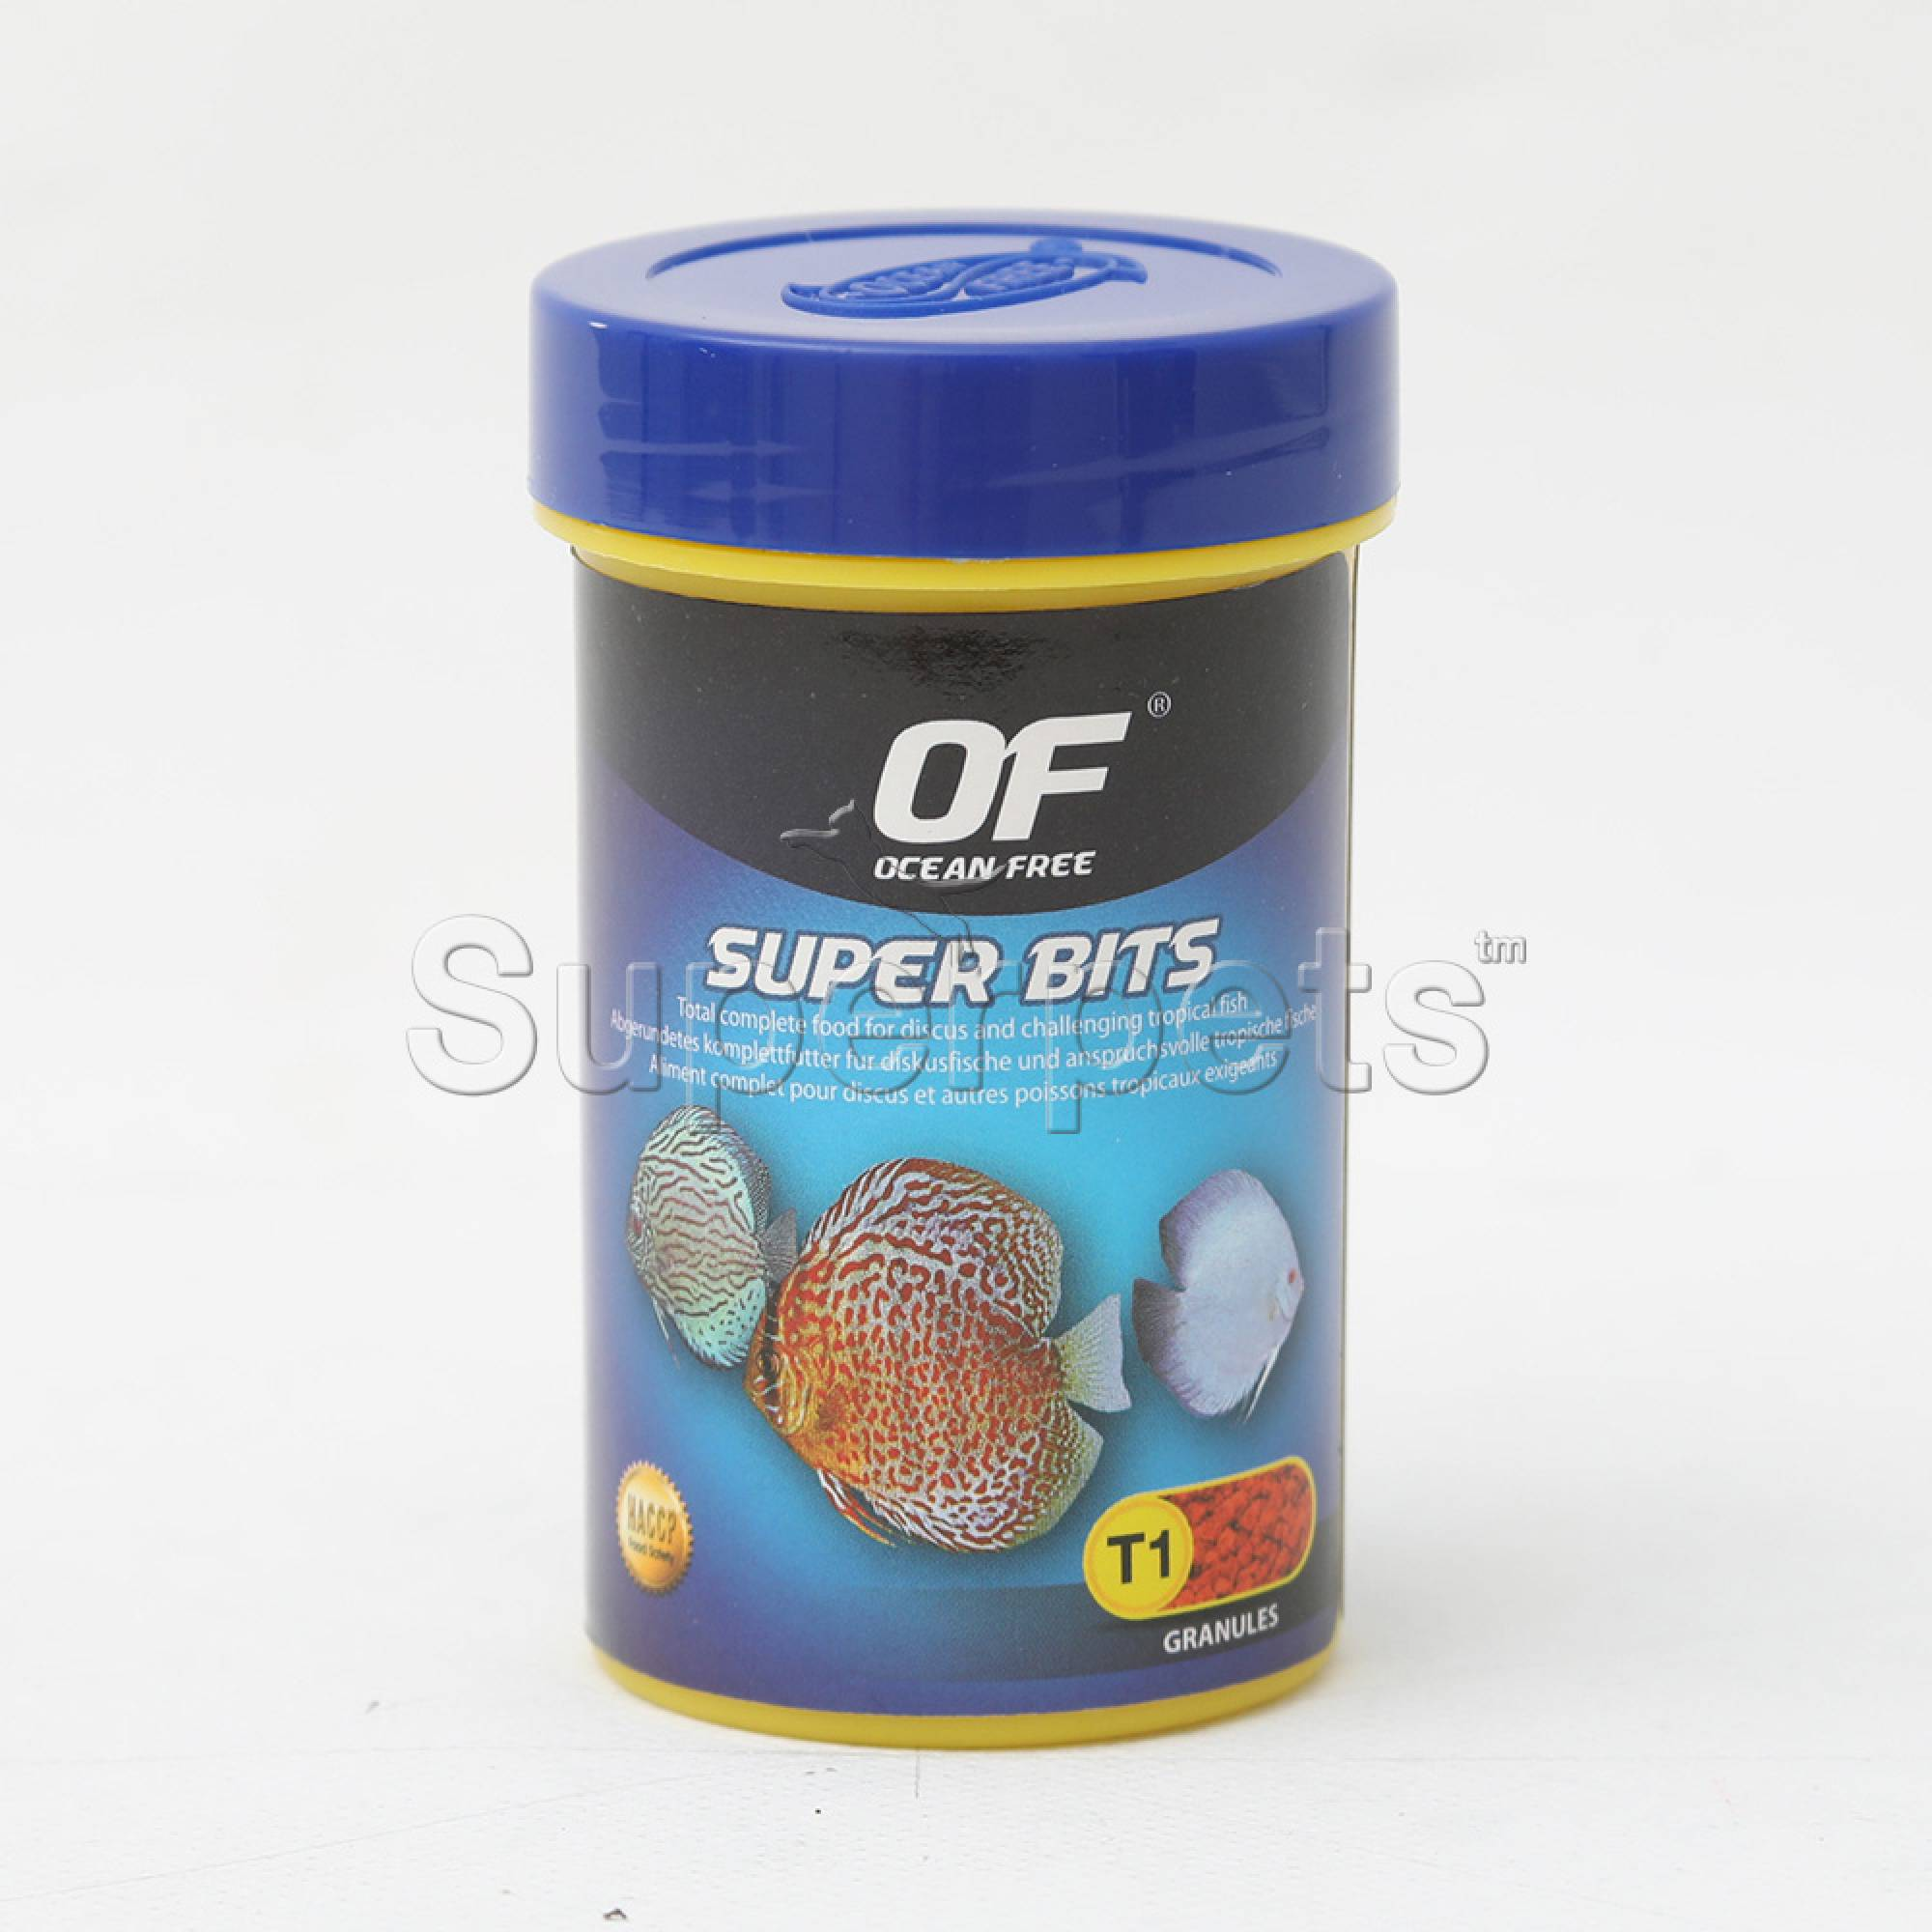 Ocean Free FF437 - Super Bits T1 Granules 110ml (45g)